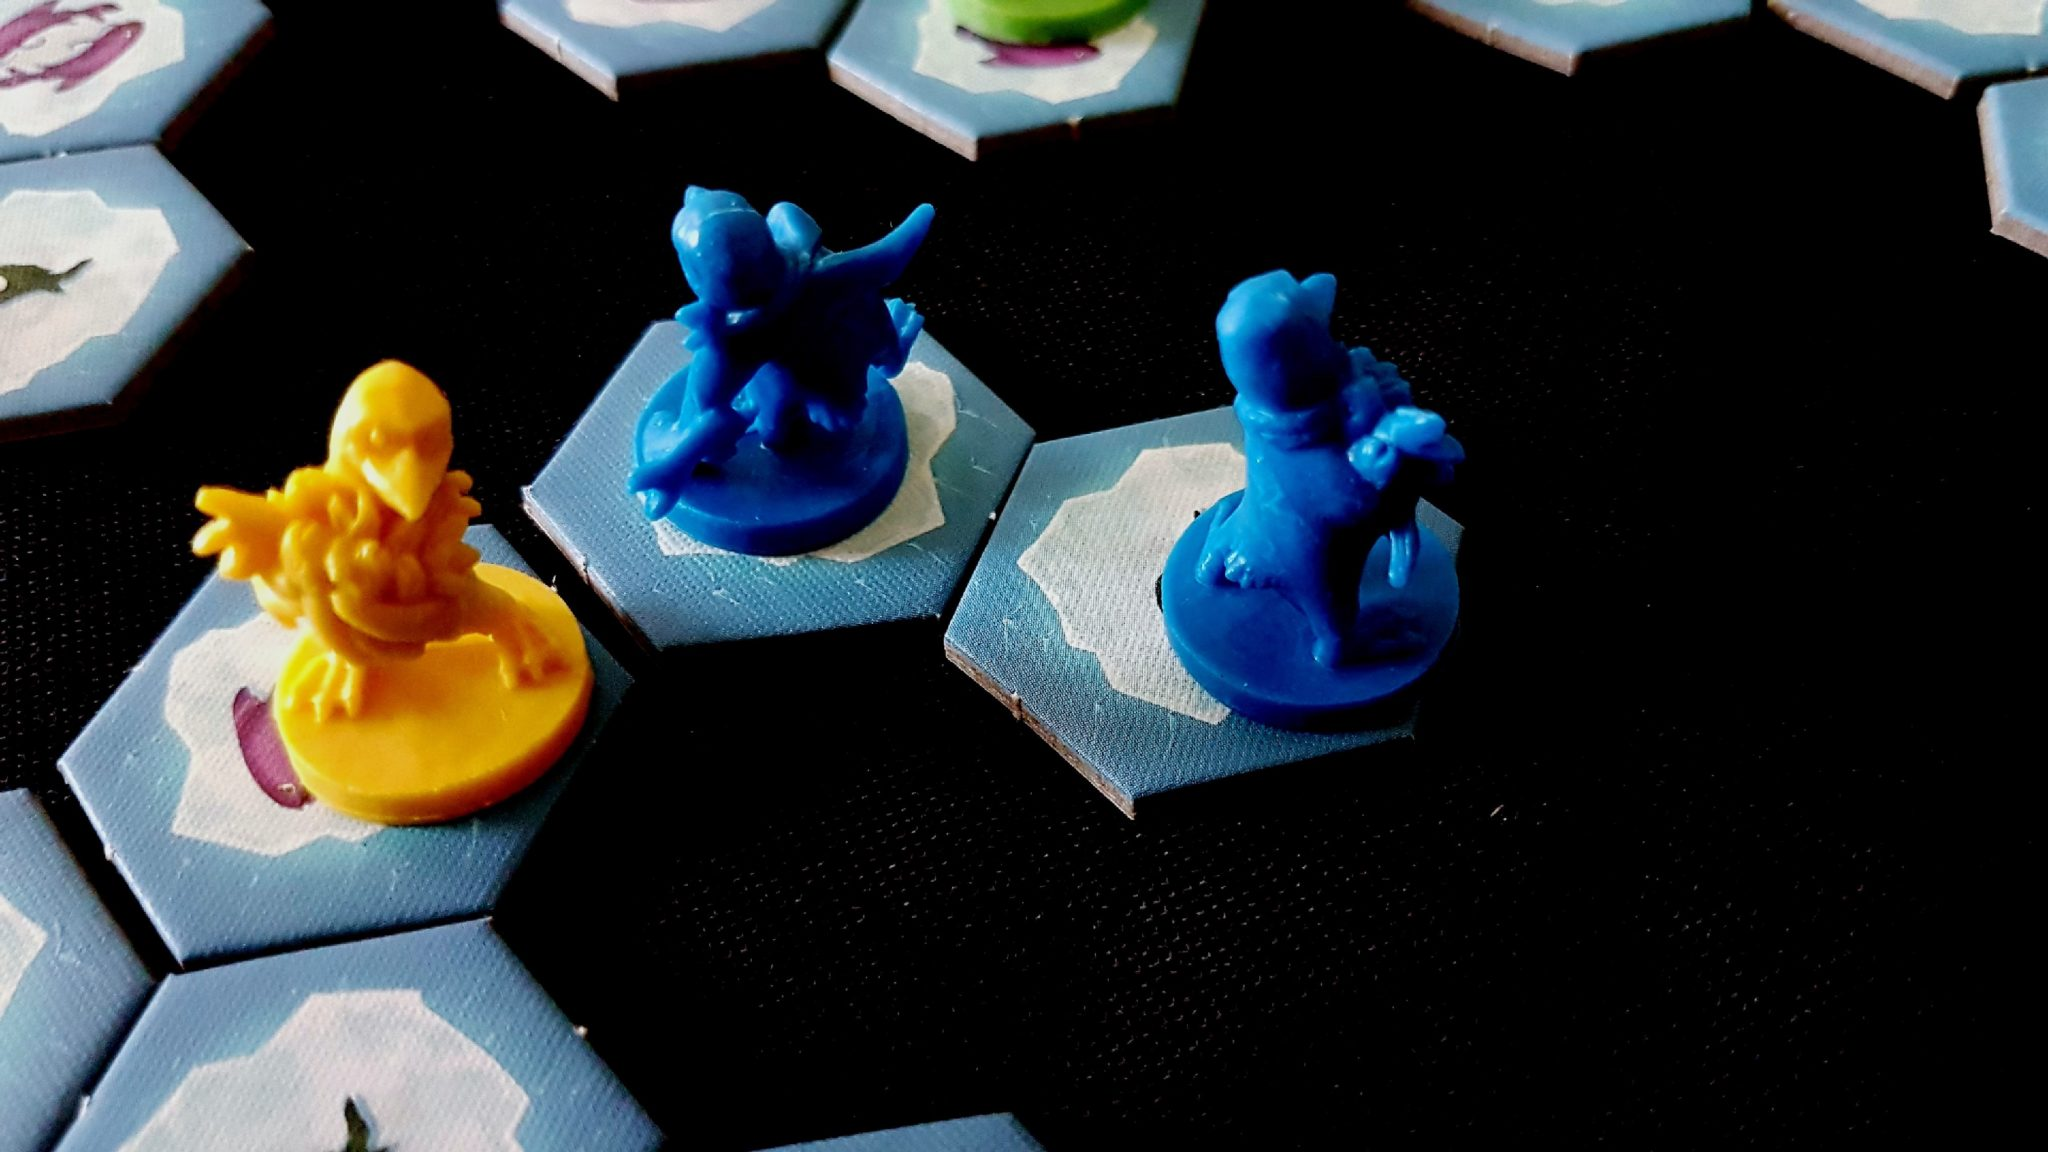 Blocking penguins